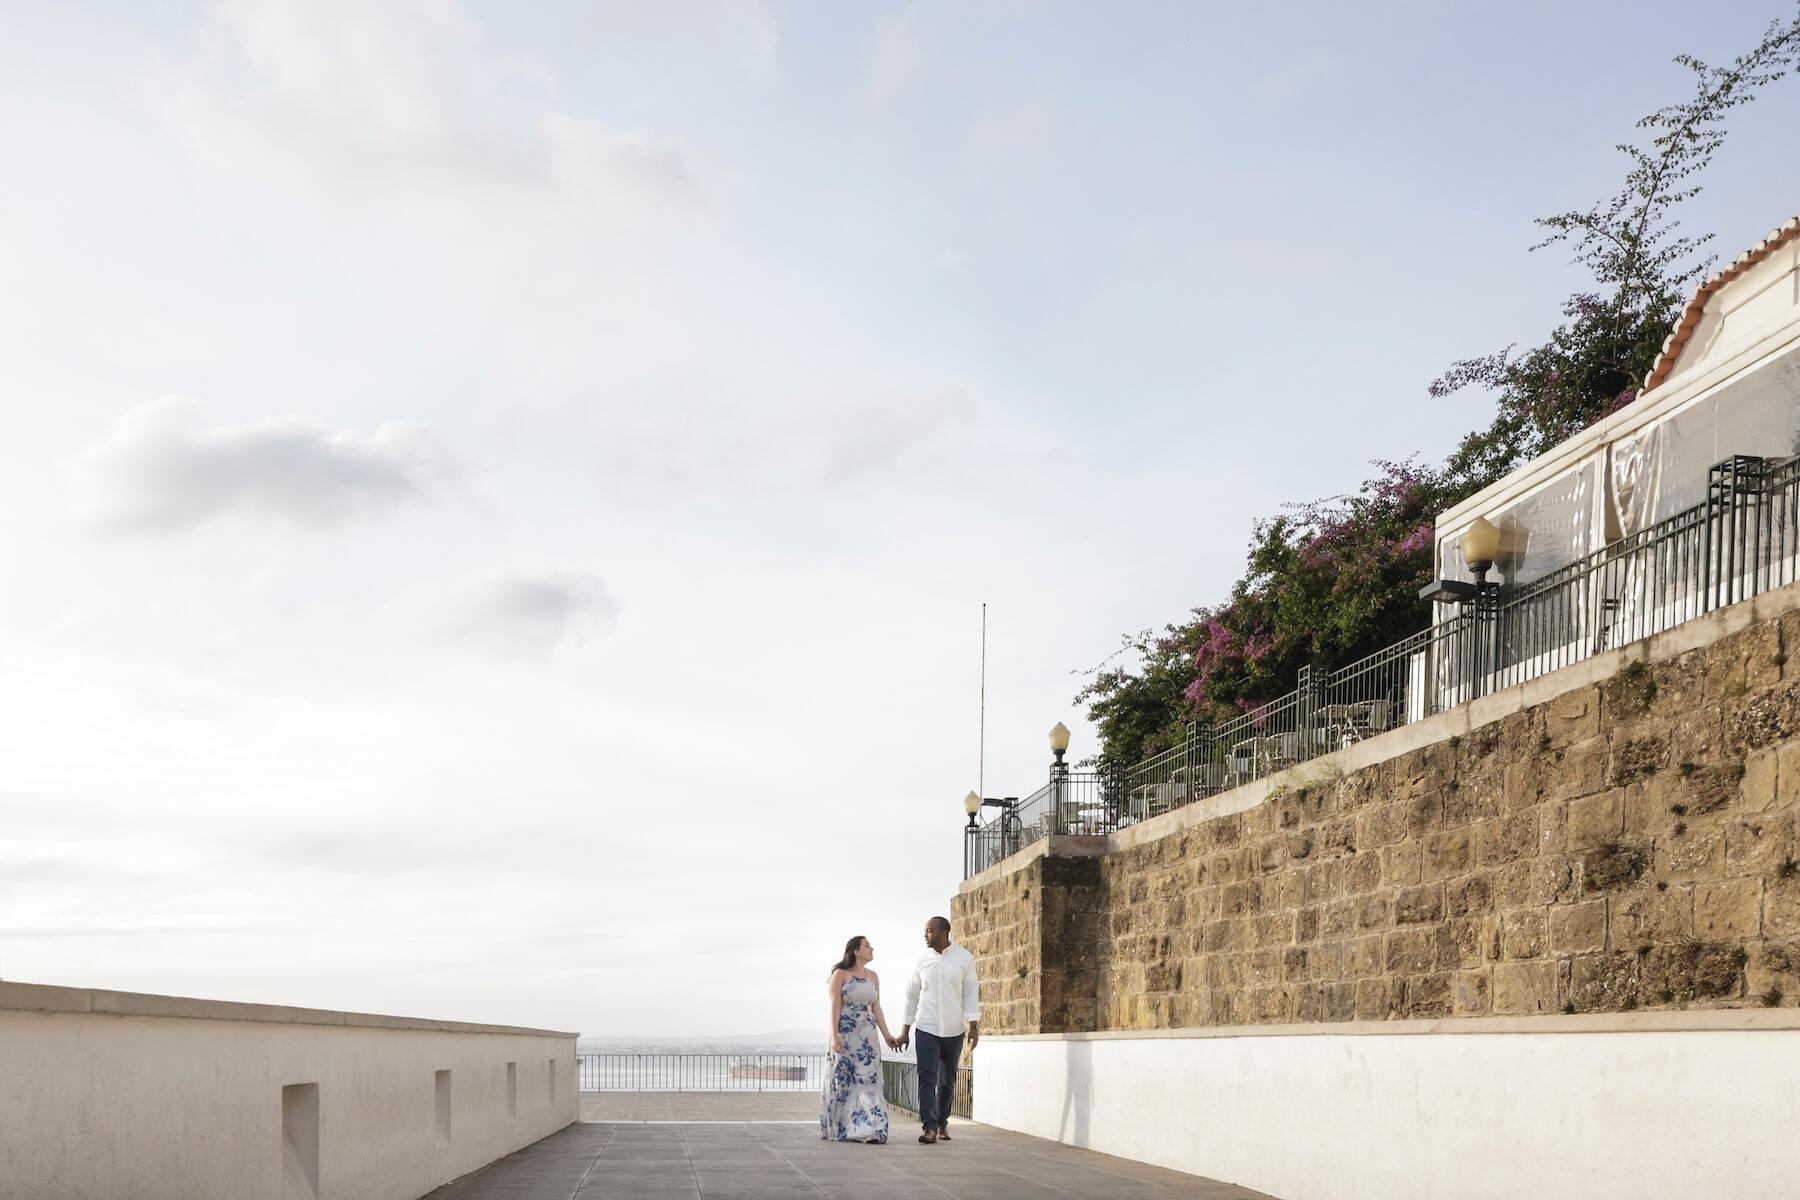 lisbon-05-24-2019-proposal-19_original